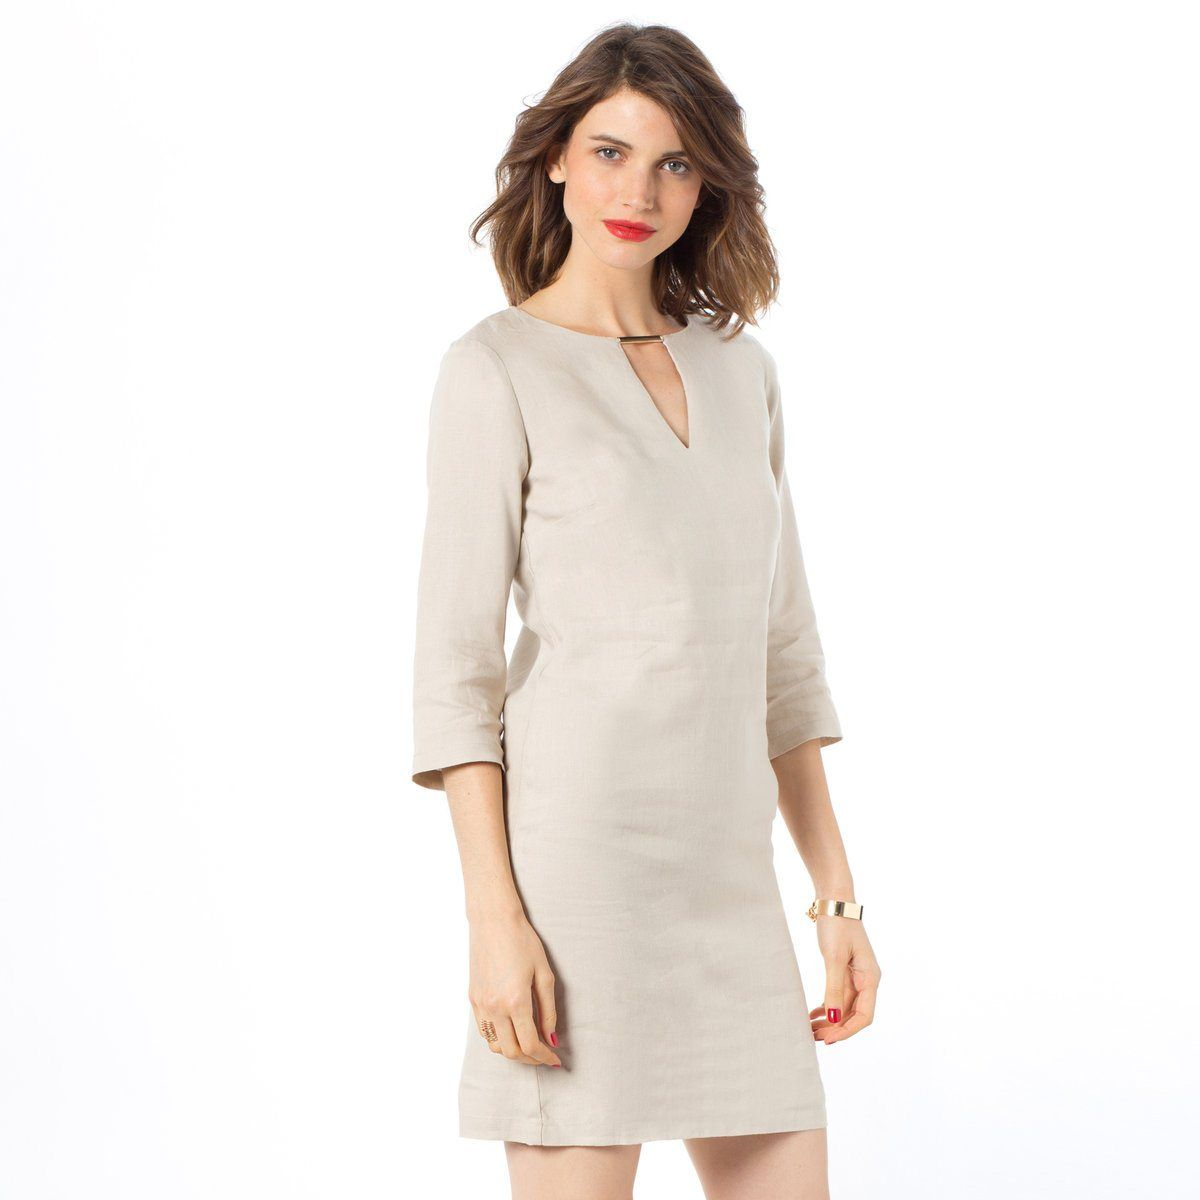 Redoute Essentiel Vestido de lino La con 34 España R mangas recto Ax6wqTz61